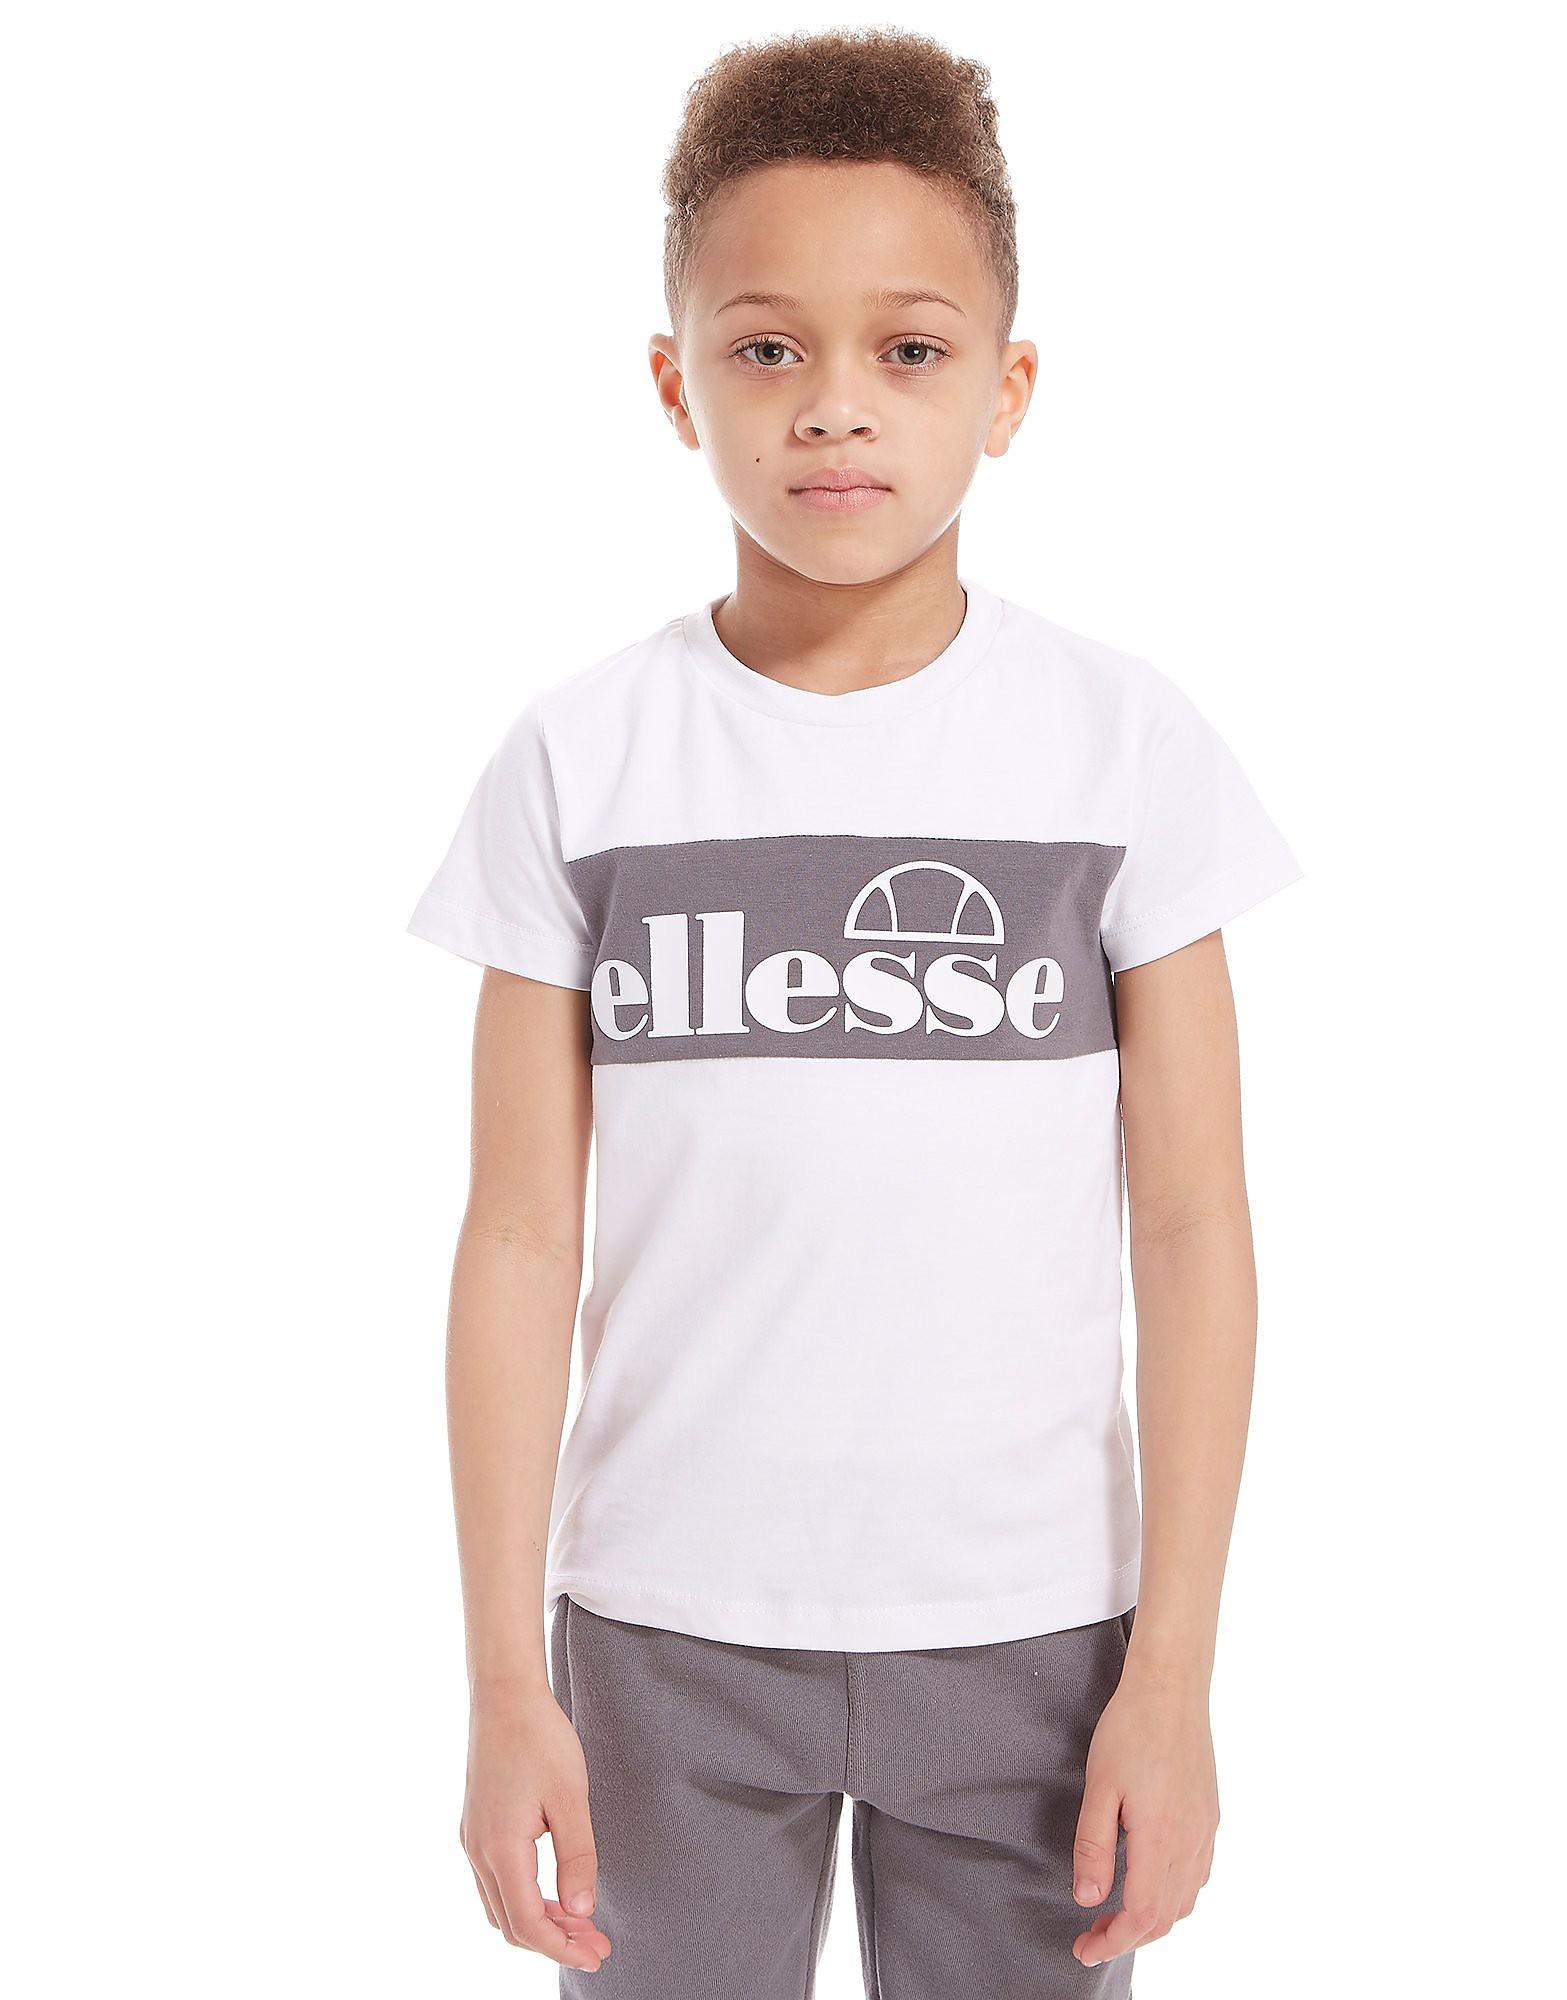 Ellesse Libo T-Shirt Children